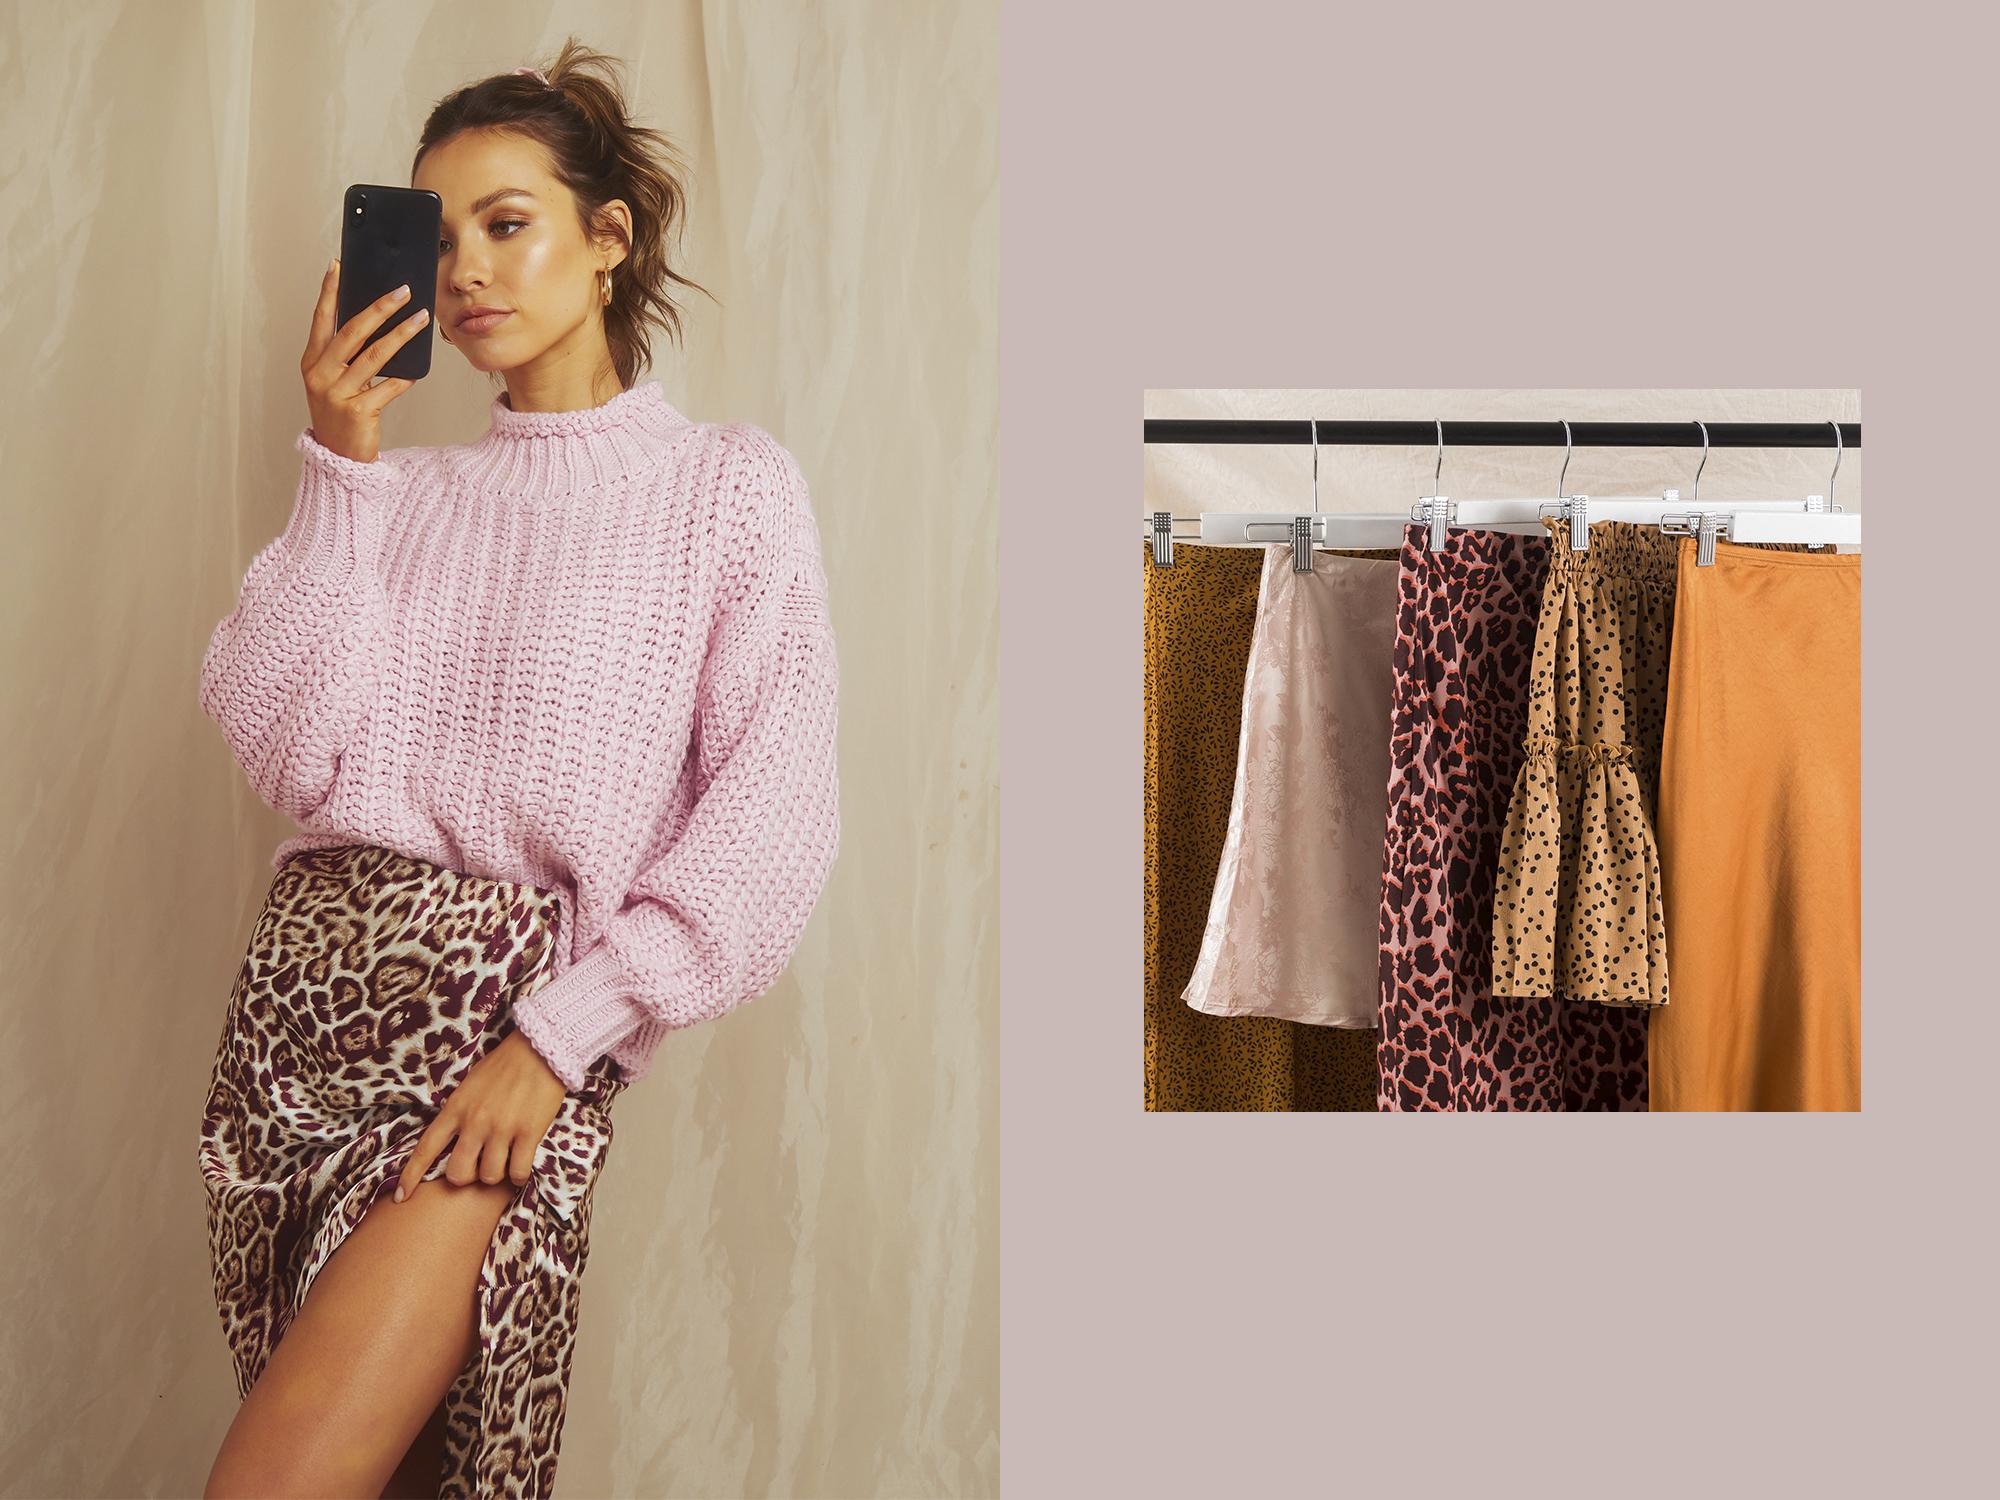 Left: Tooki Bloom Sweater and West Village Skirt  Right: Verona Skirt, Adama Skirt, Leopard Skirt, Nuance Skirt and Verona Skirt